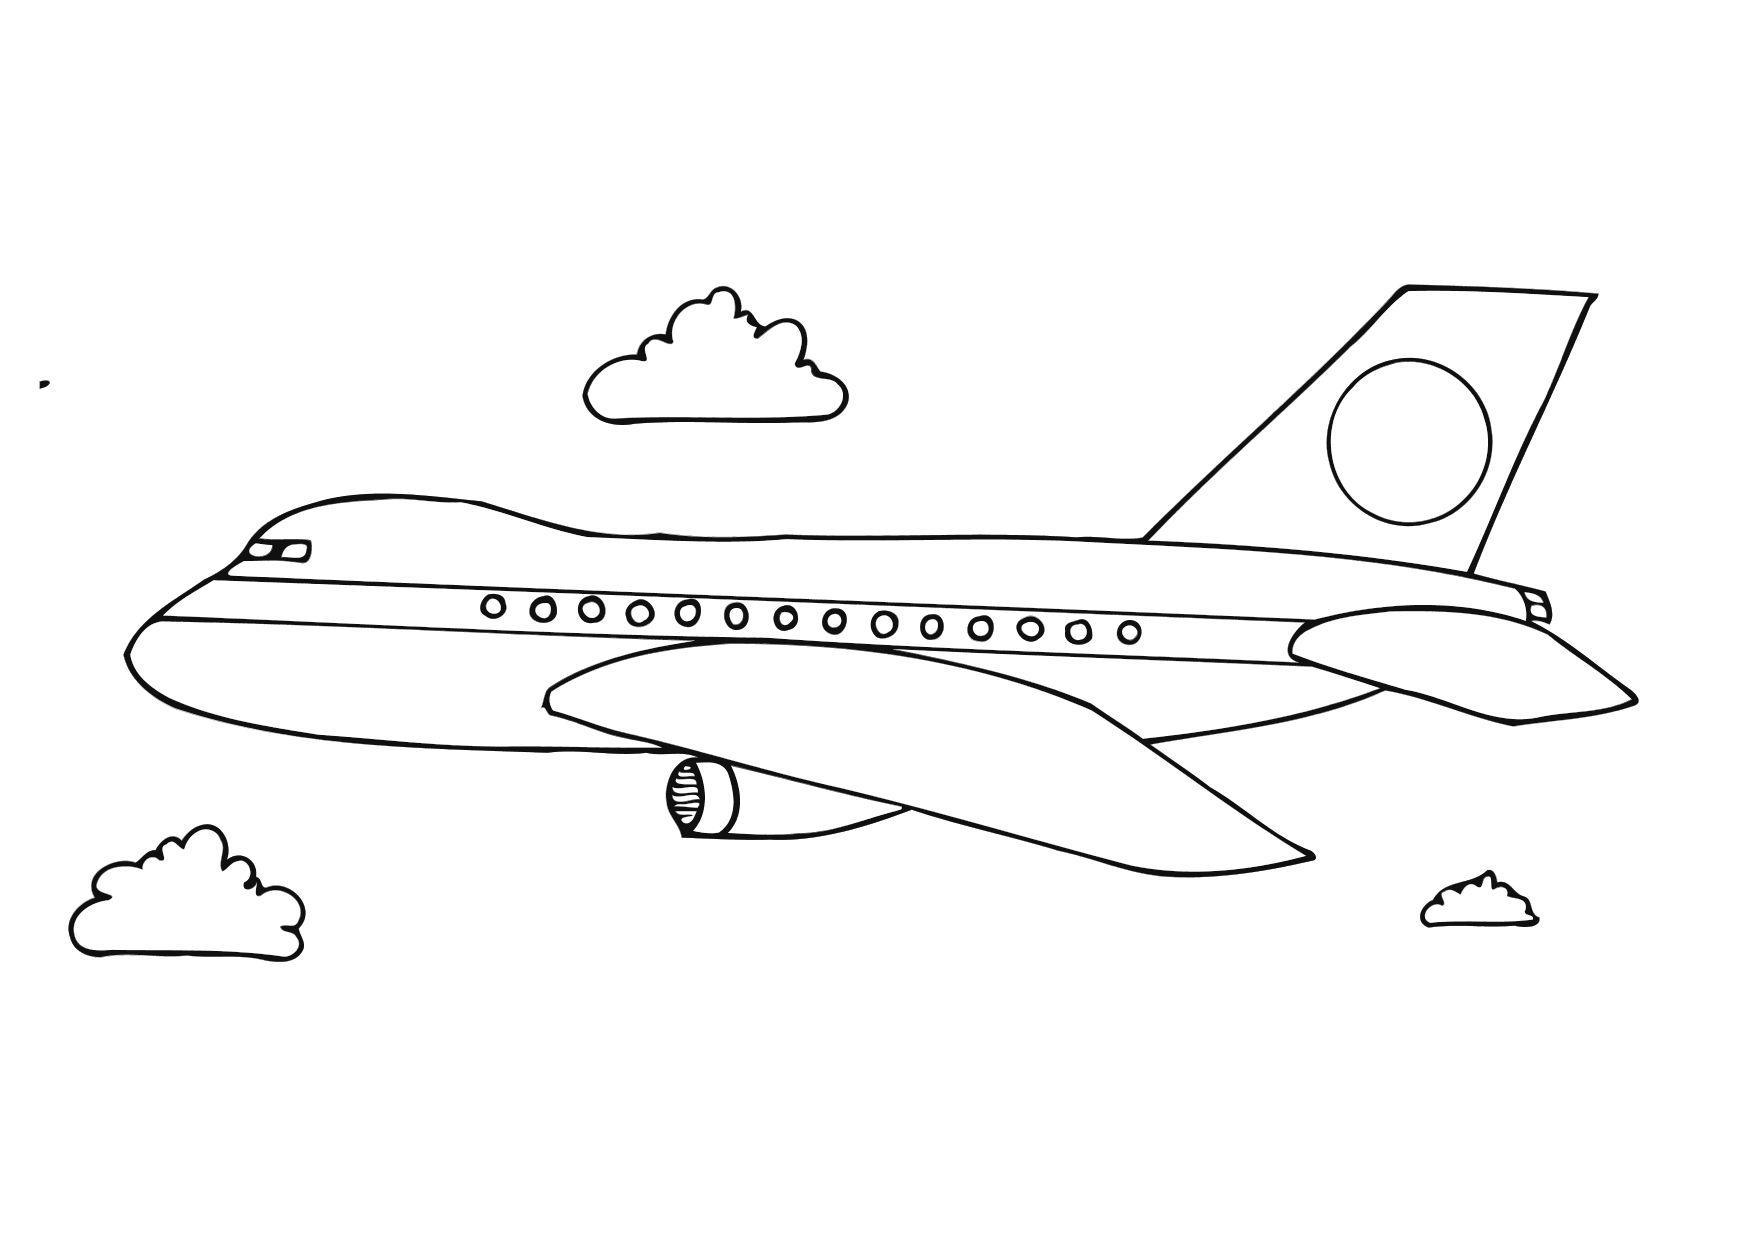 Coloring page aeroplane img 12281